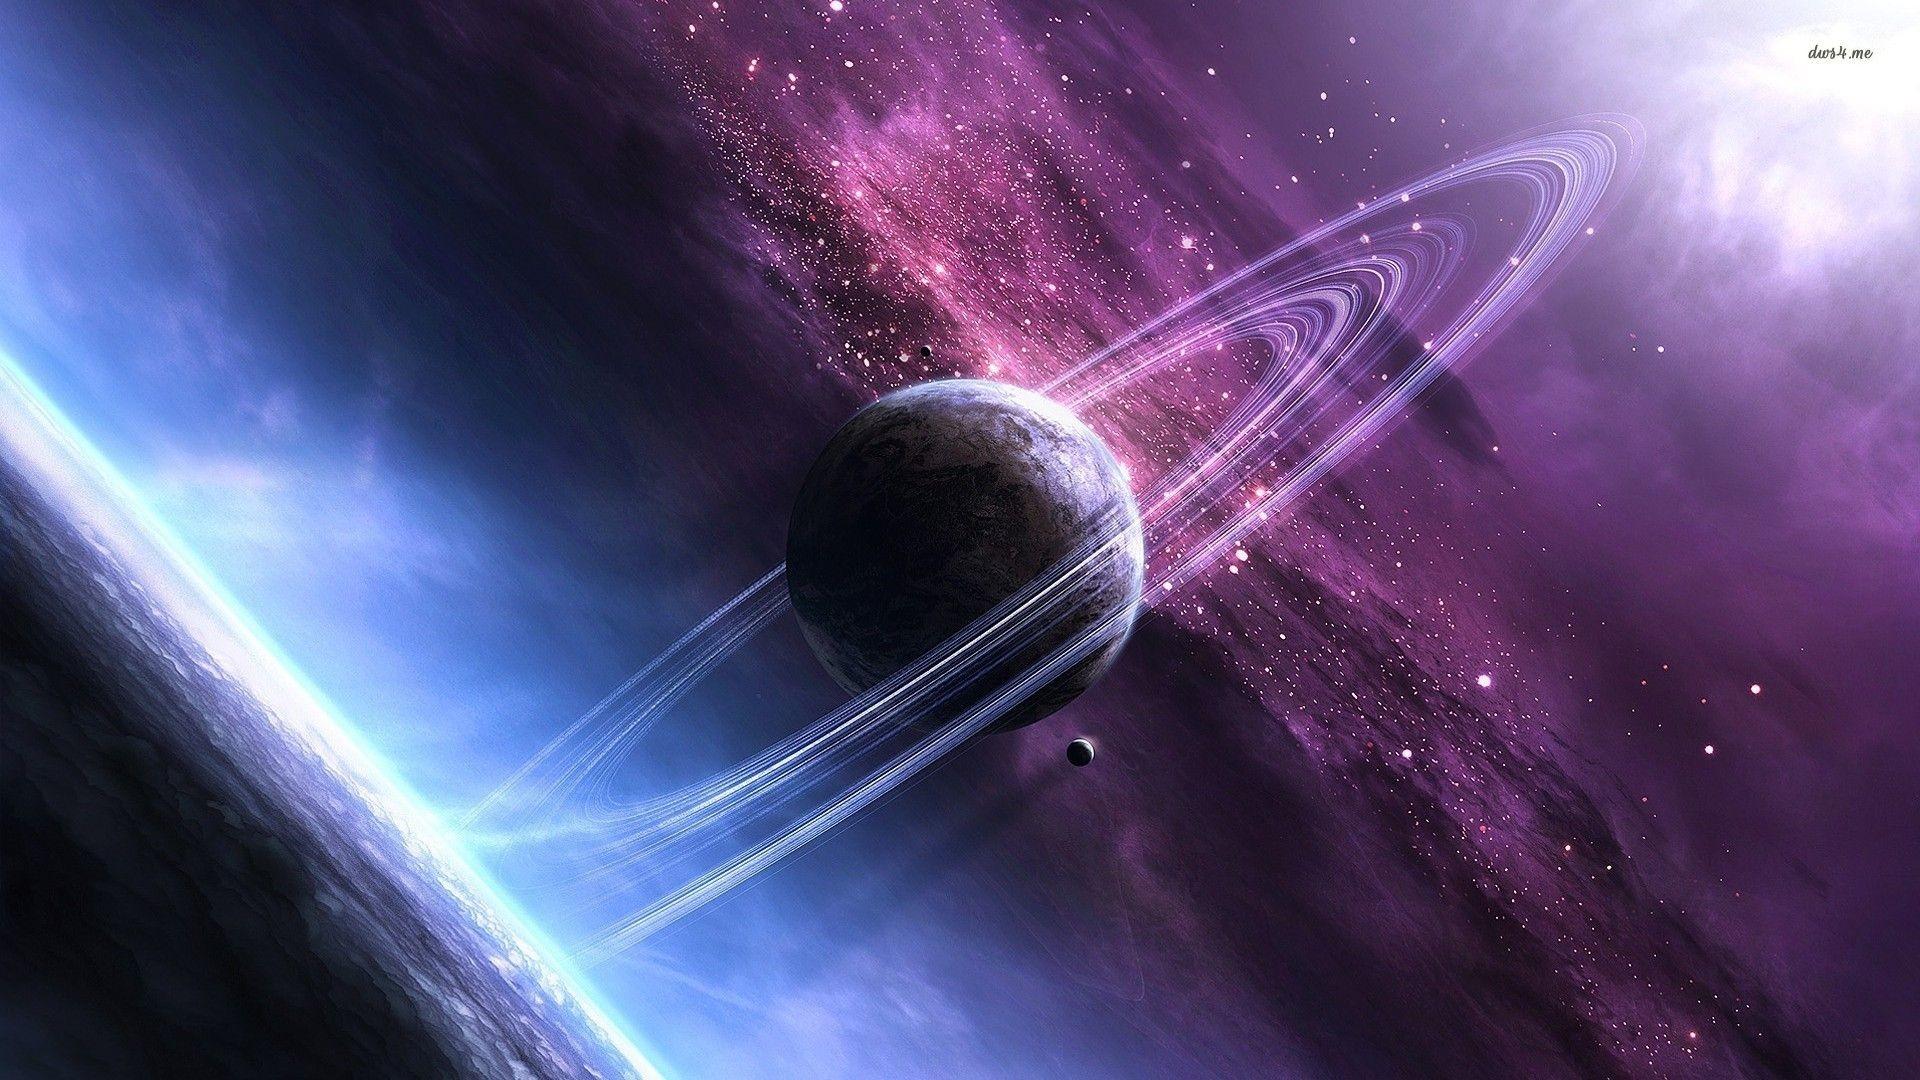 Saturn HDQ Wallpaper Download, Chelsey Karsten